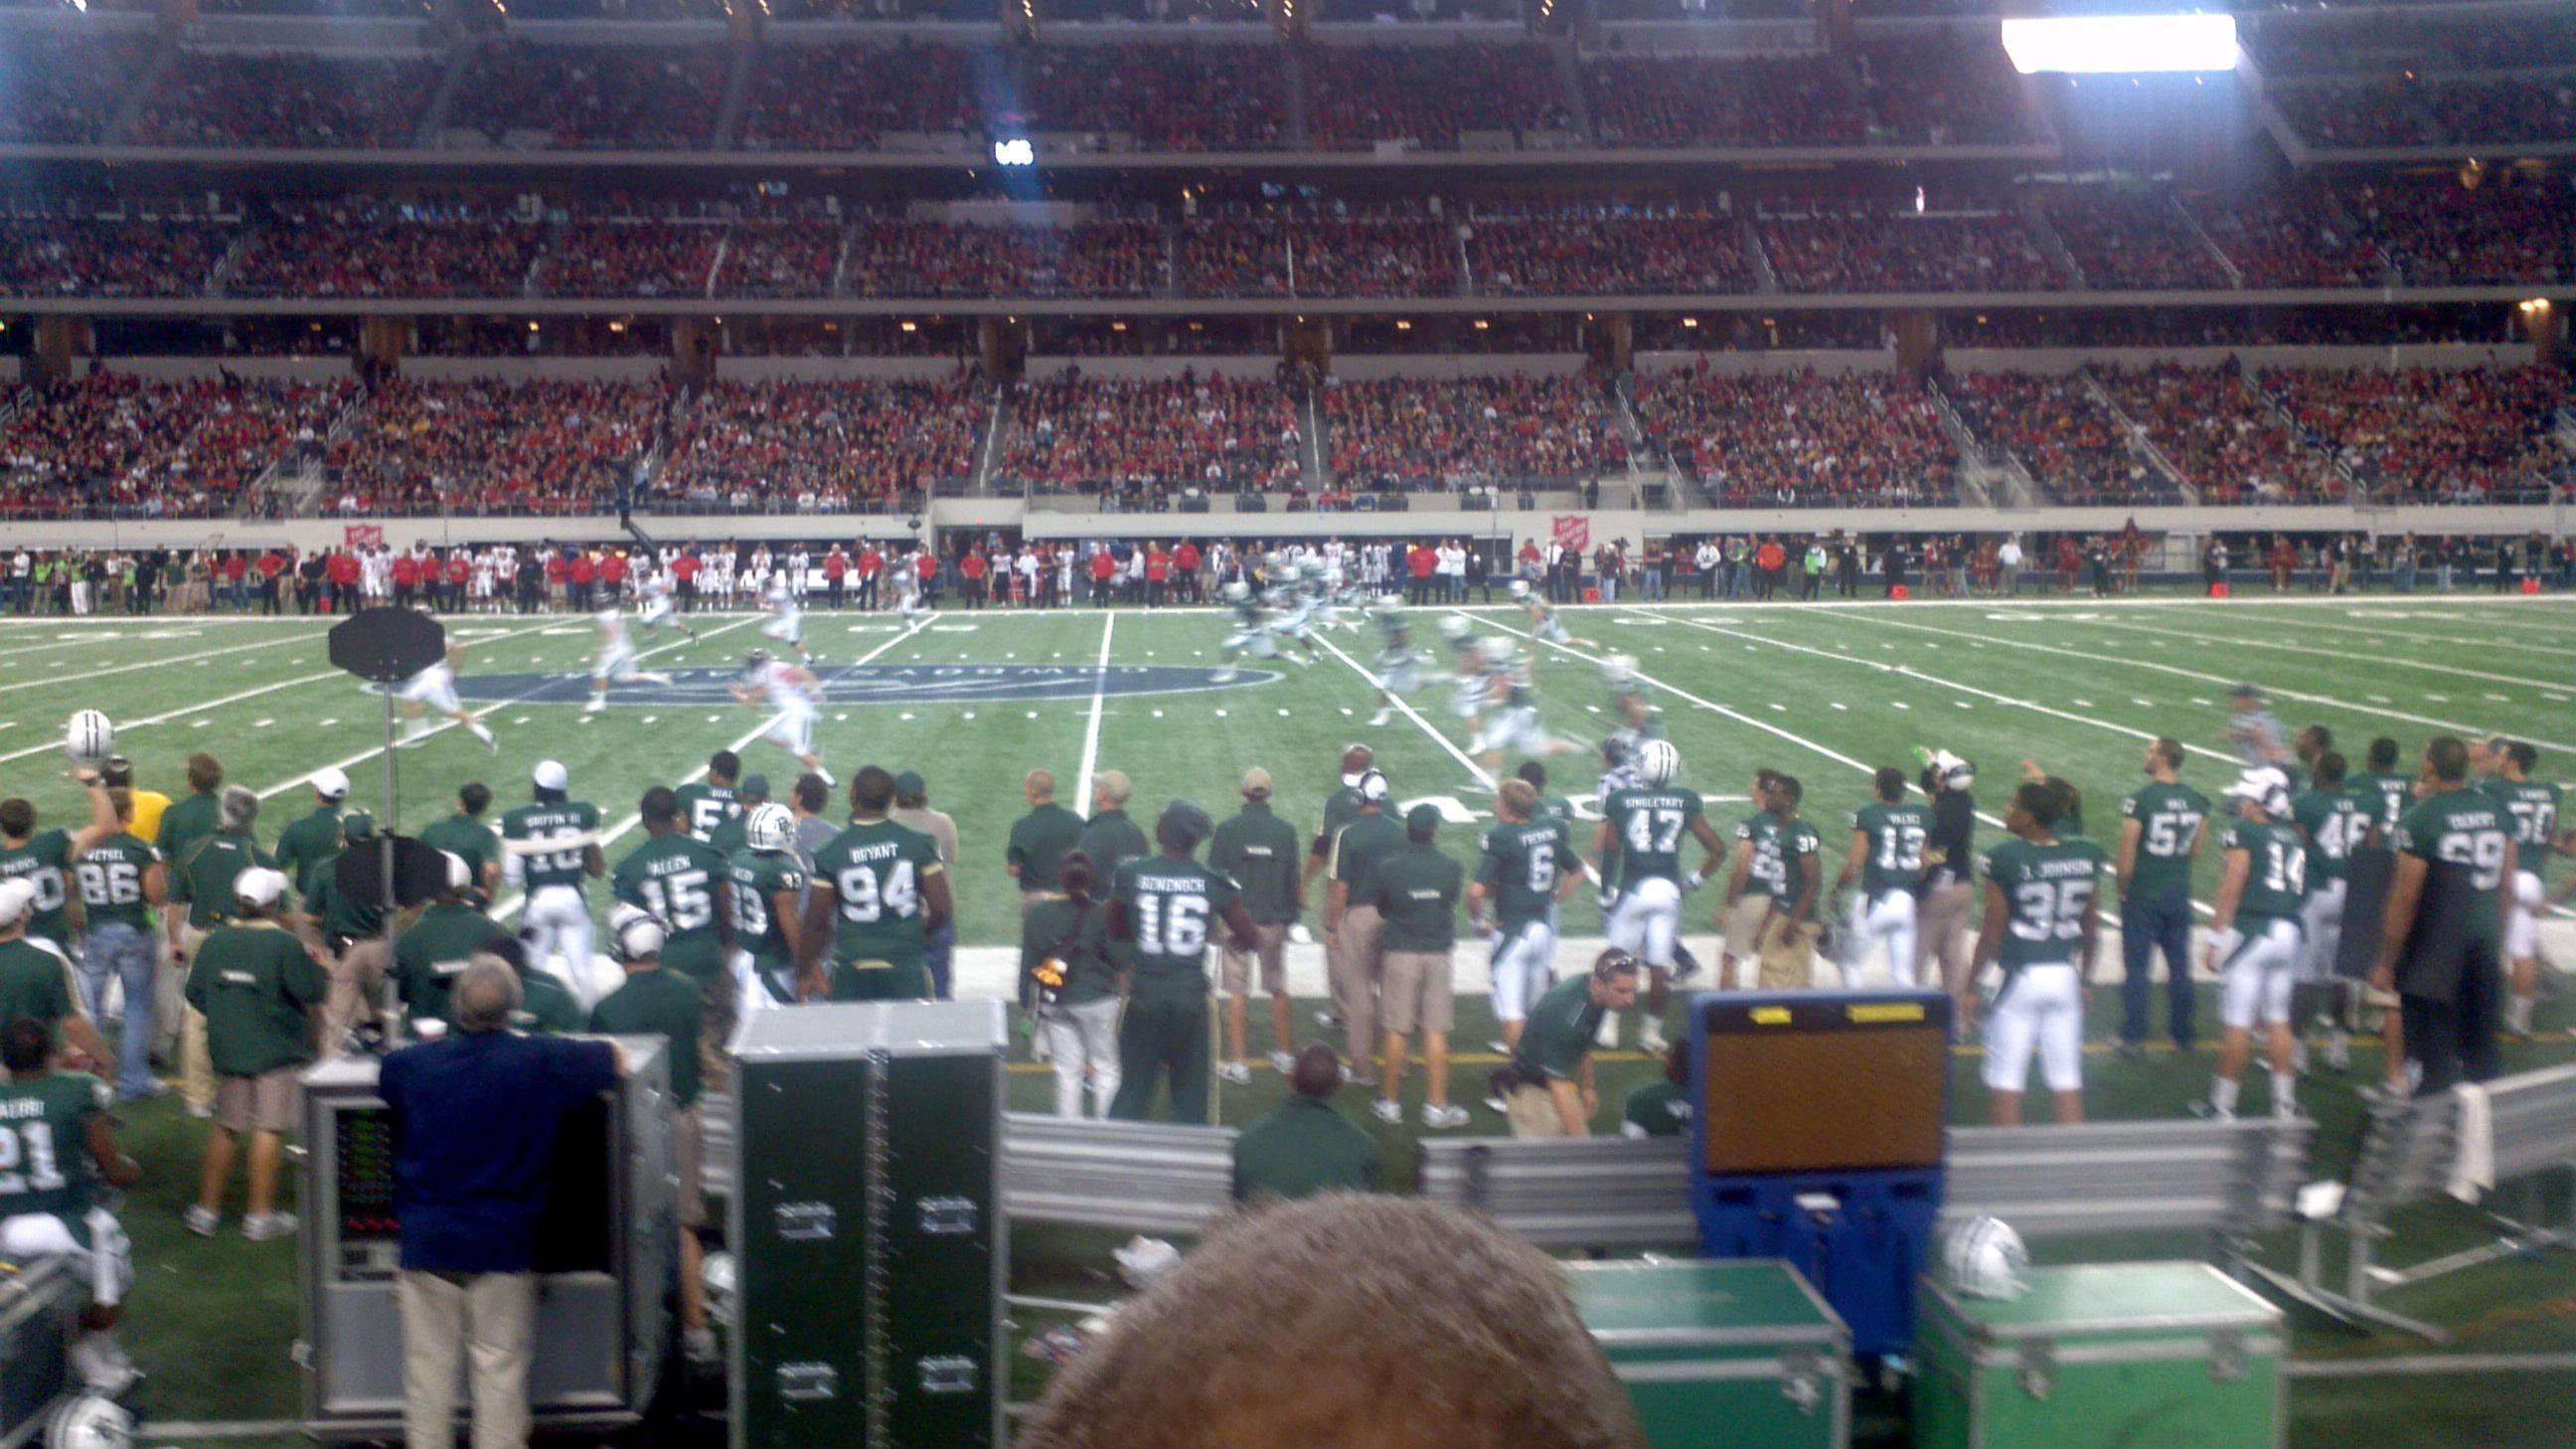 AT&T Stadium Section C110 Row 2 Seat 12